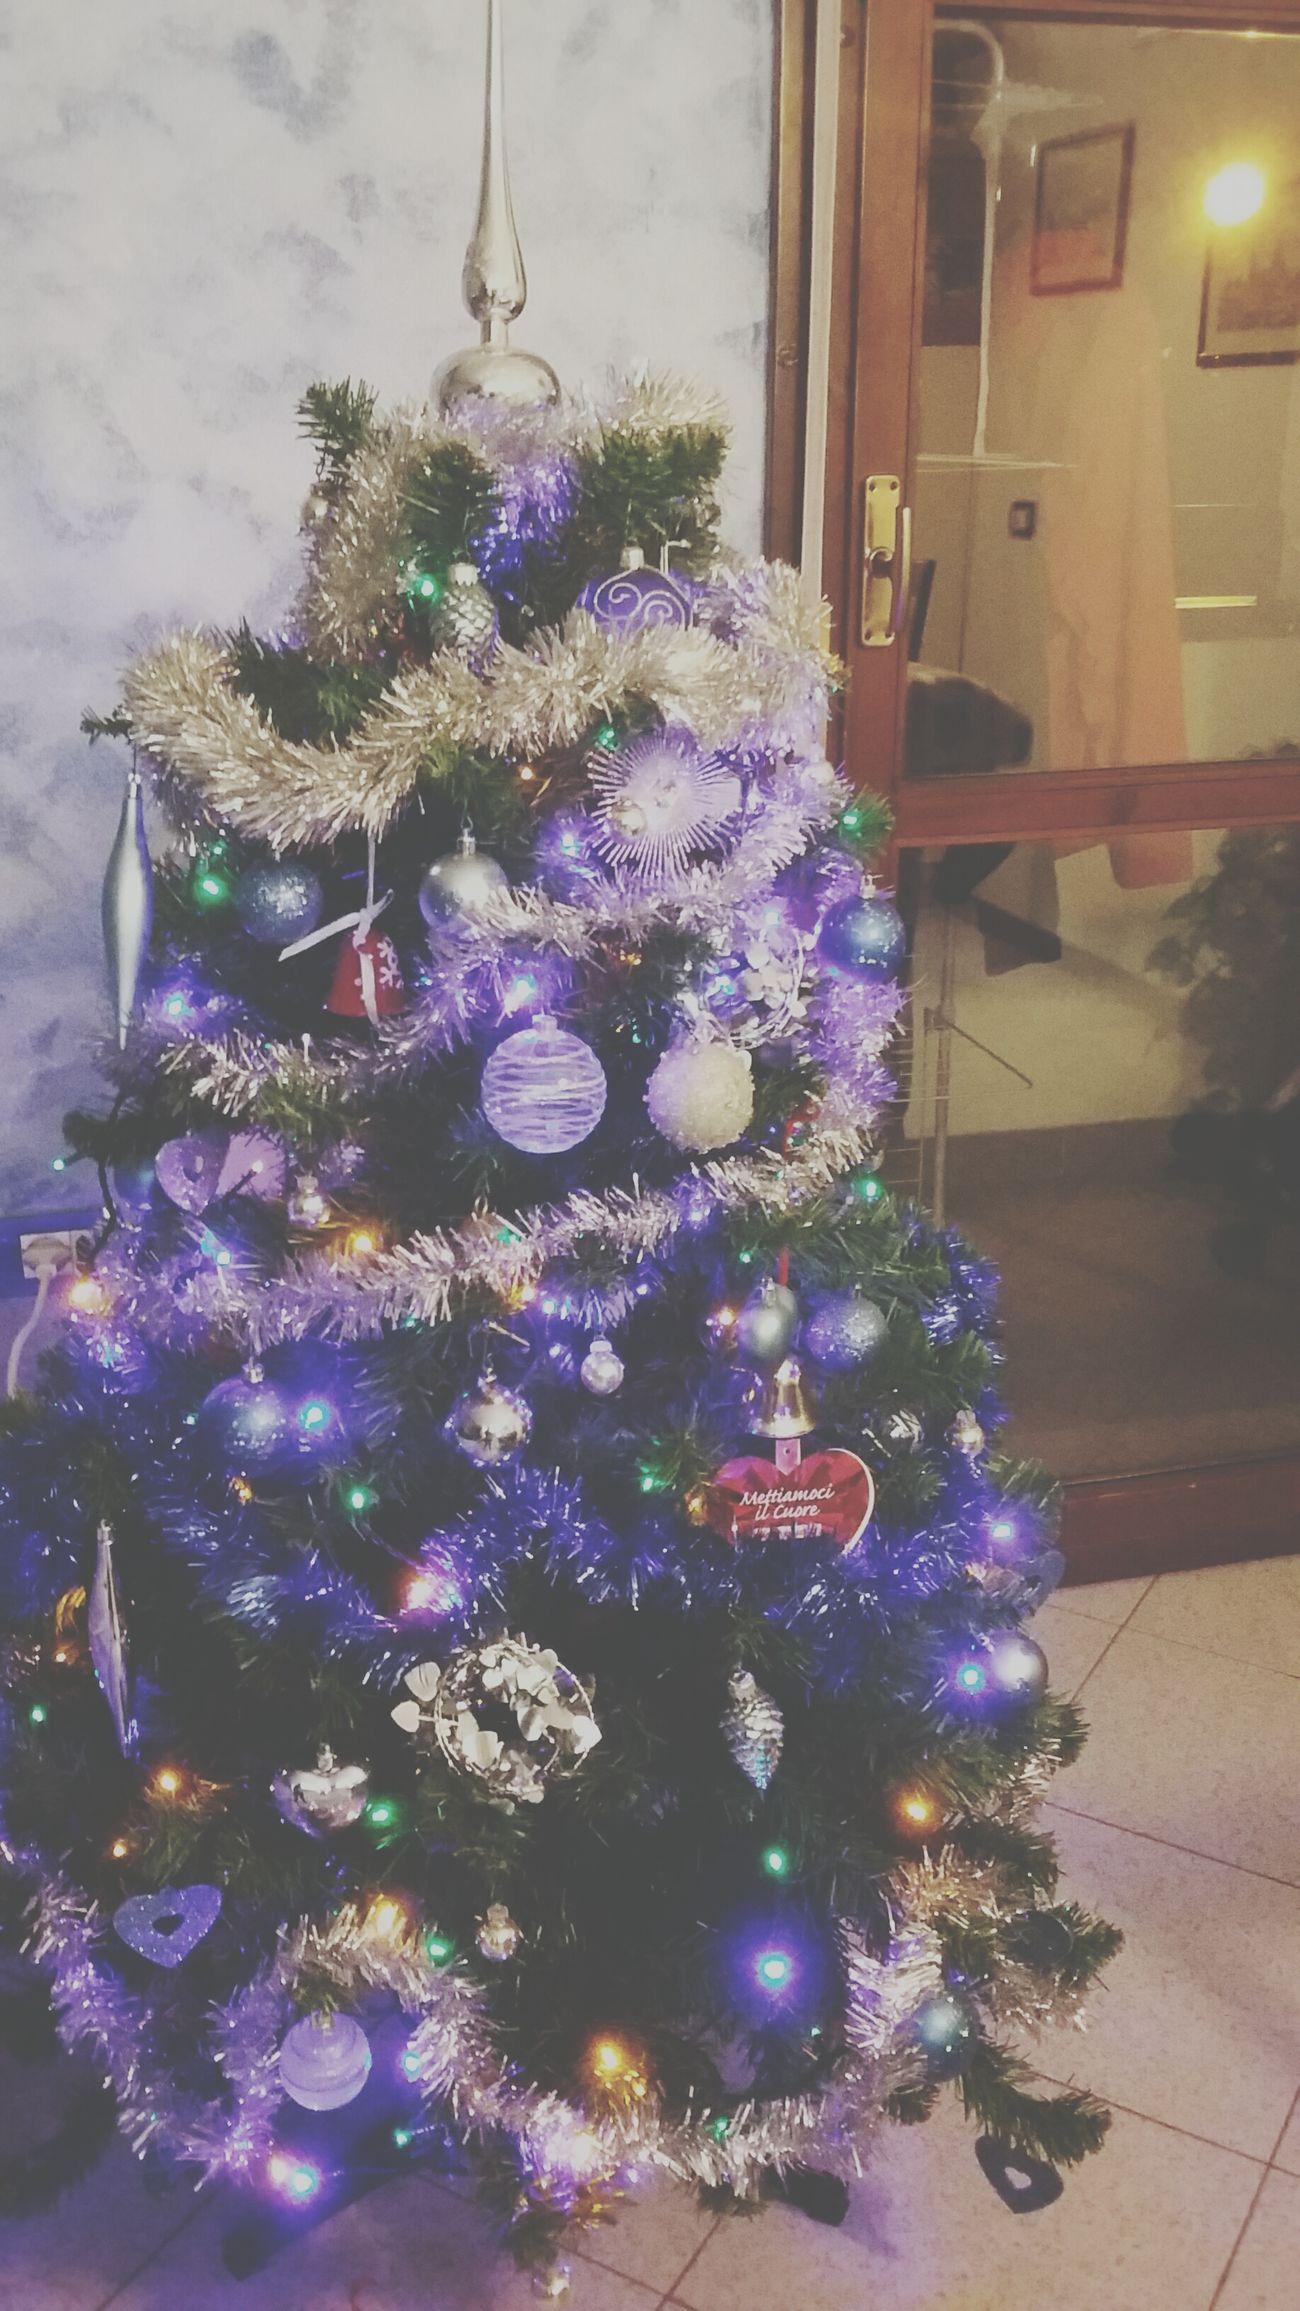 Happychristmas Christmas Tree Pallinecolorate Piccolelucine Natale2015 Buon Natale Freddo Polare!😆 Freddocaneancheseceilsole